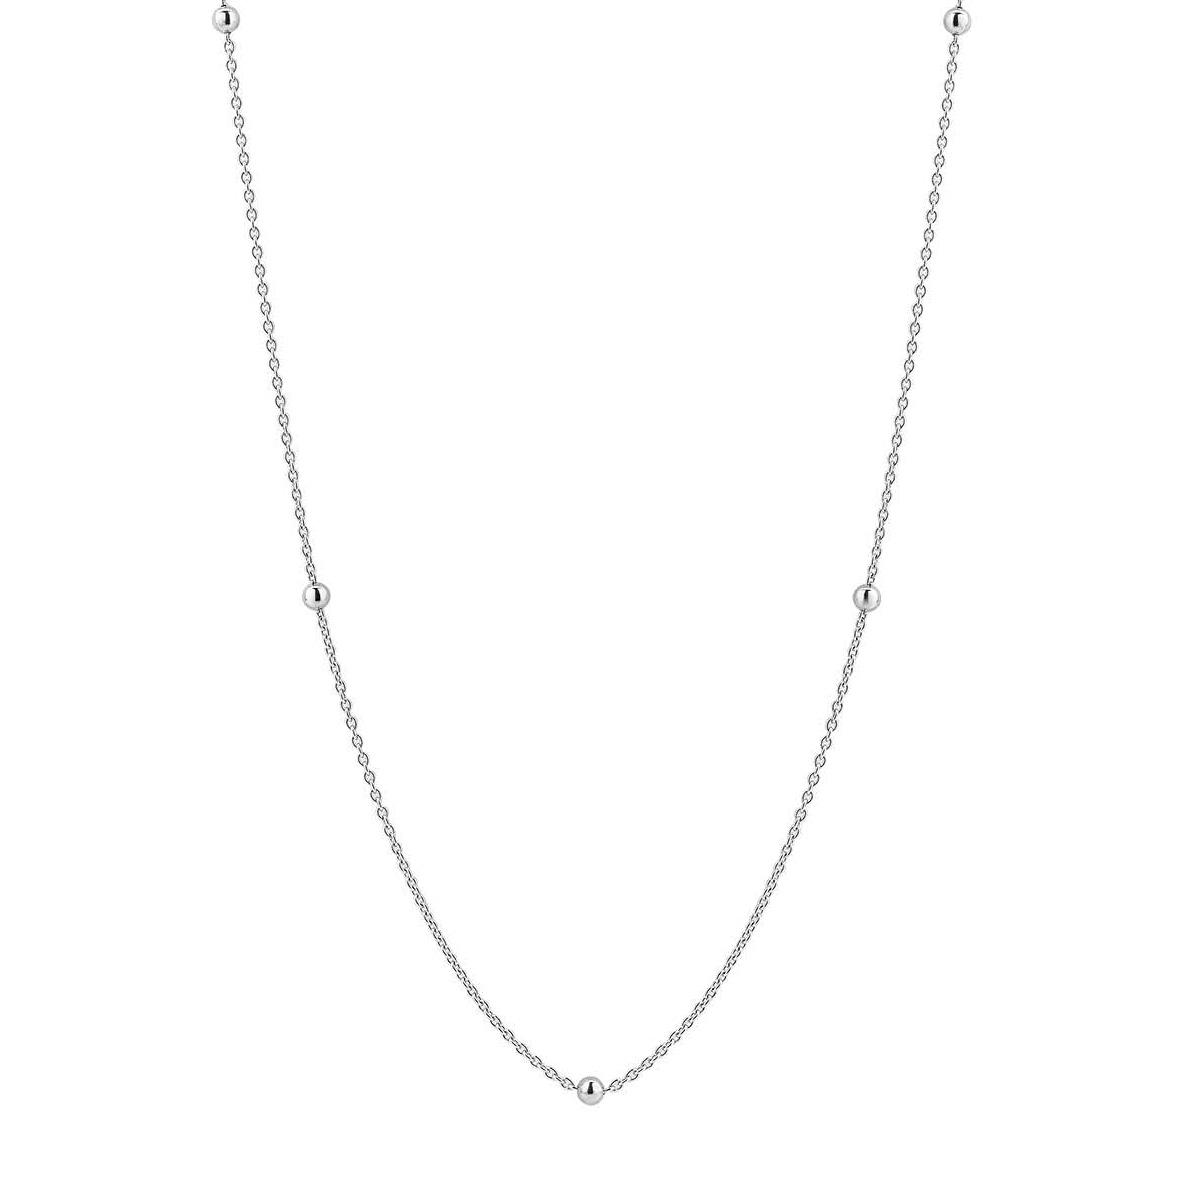 TI SENTO-Milano 3934SI Ketting zilver 60 cm